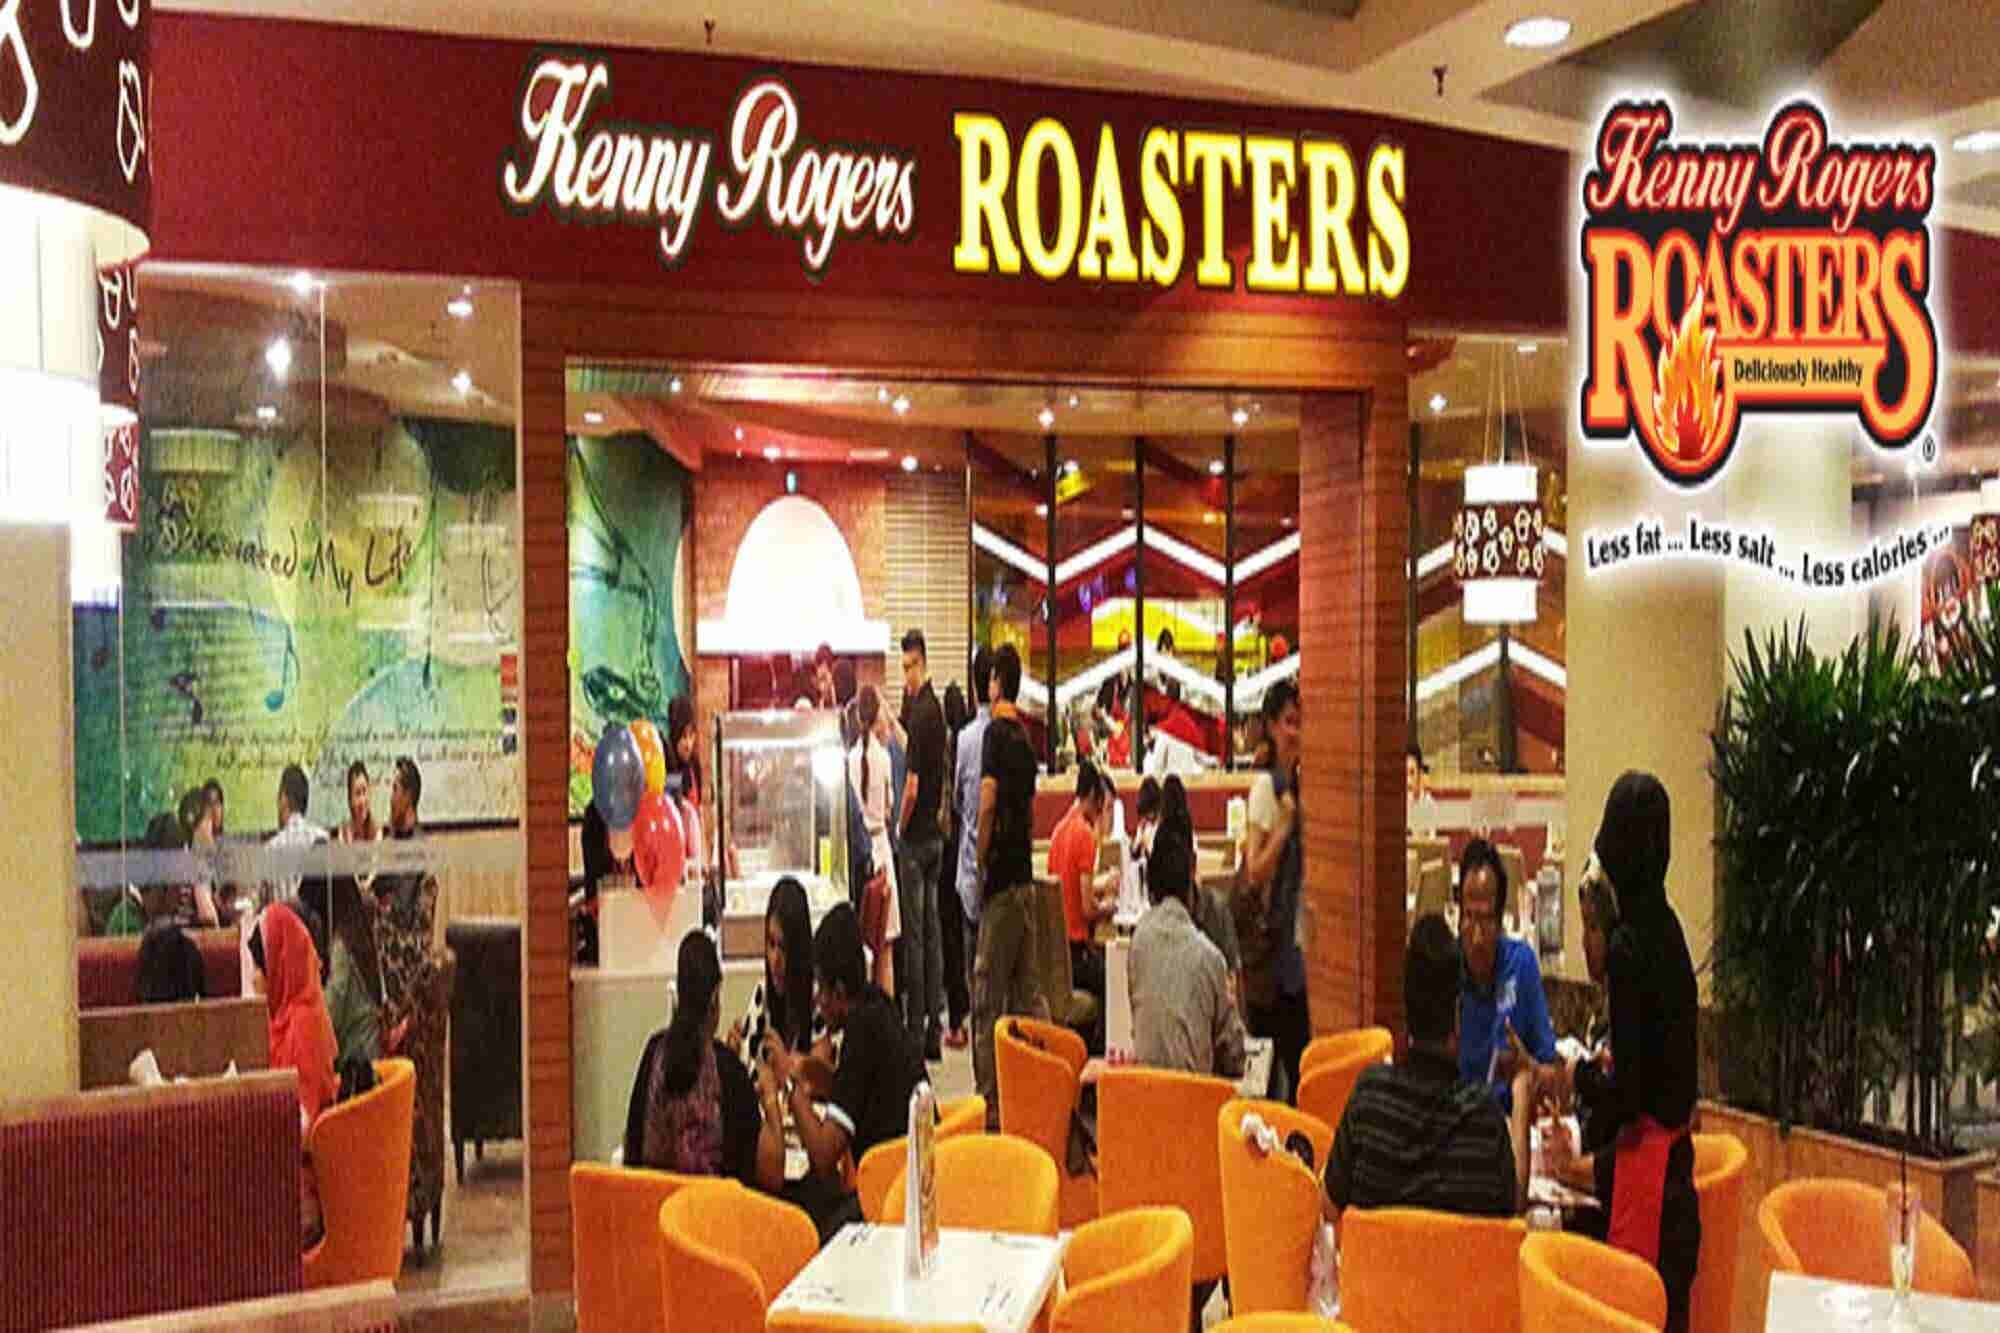 Malaysia's Berjaya Food Strengthens Its Foothold in India